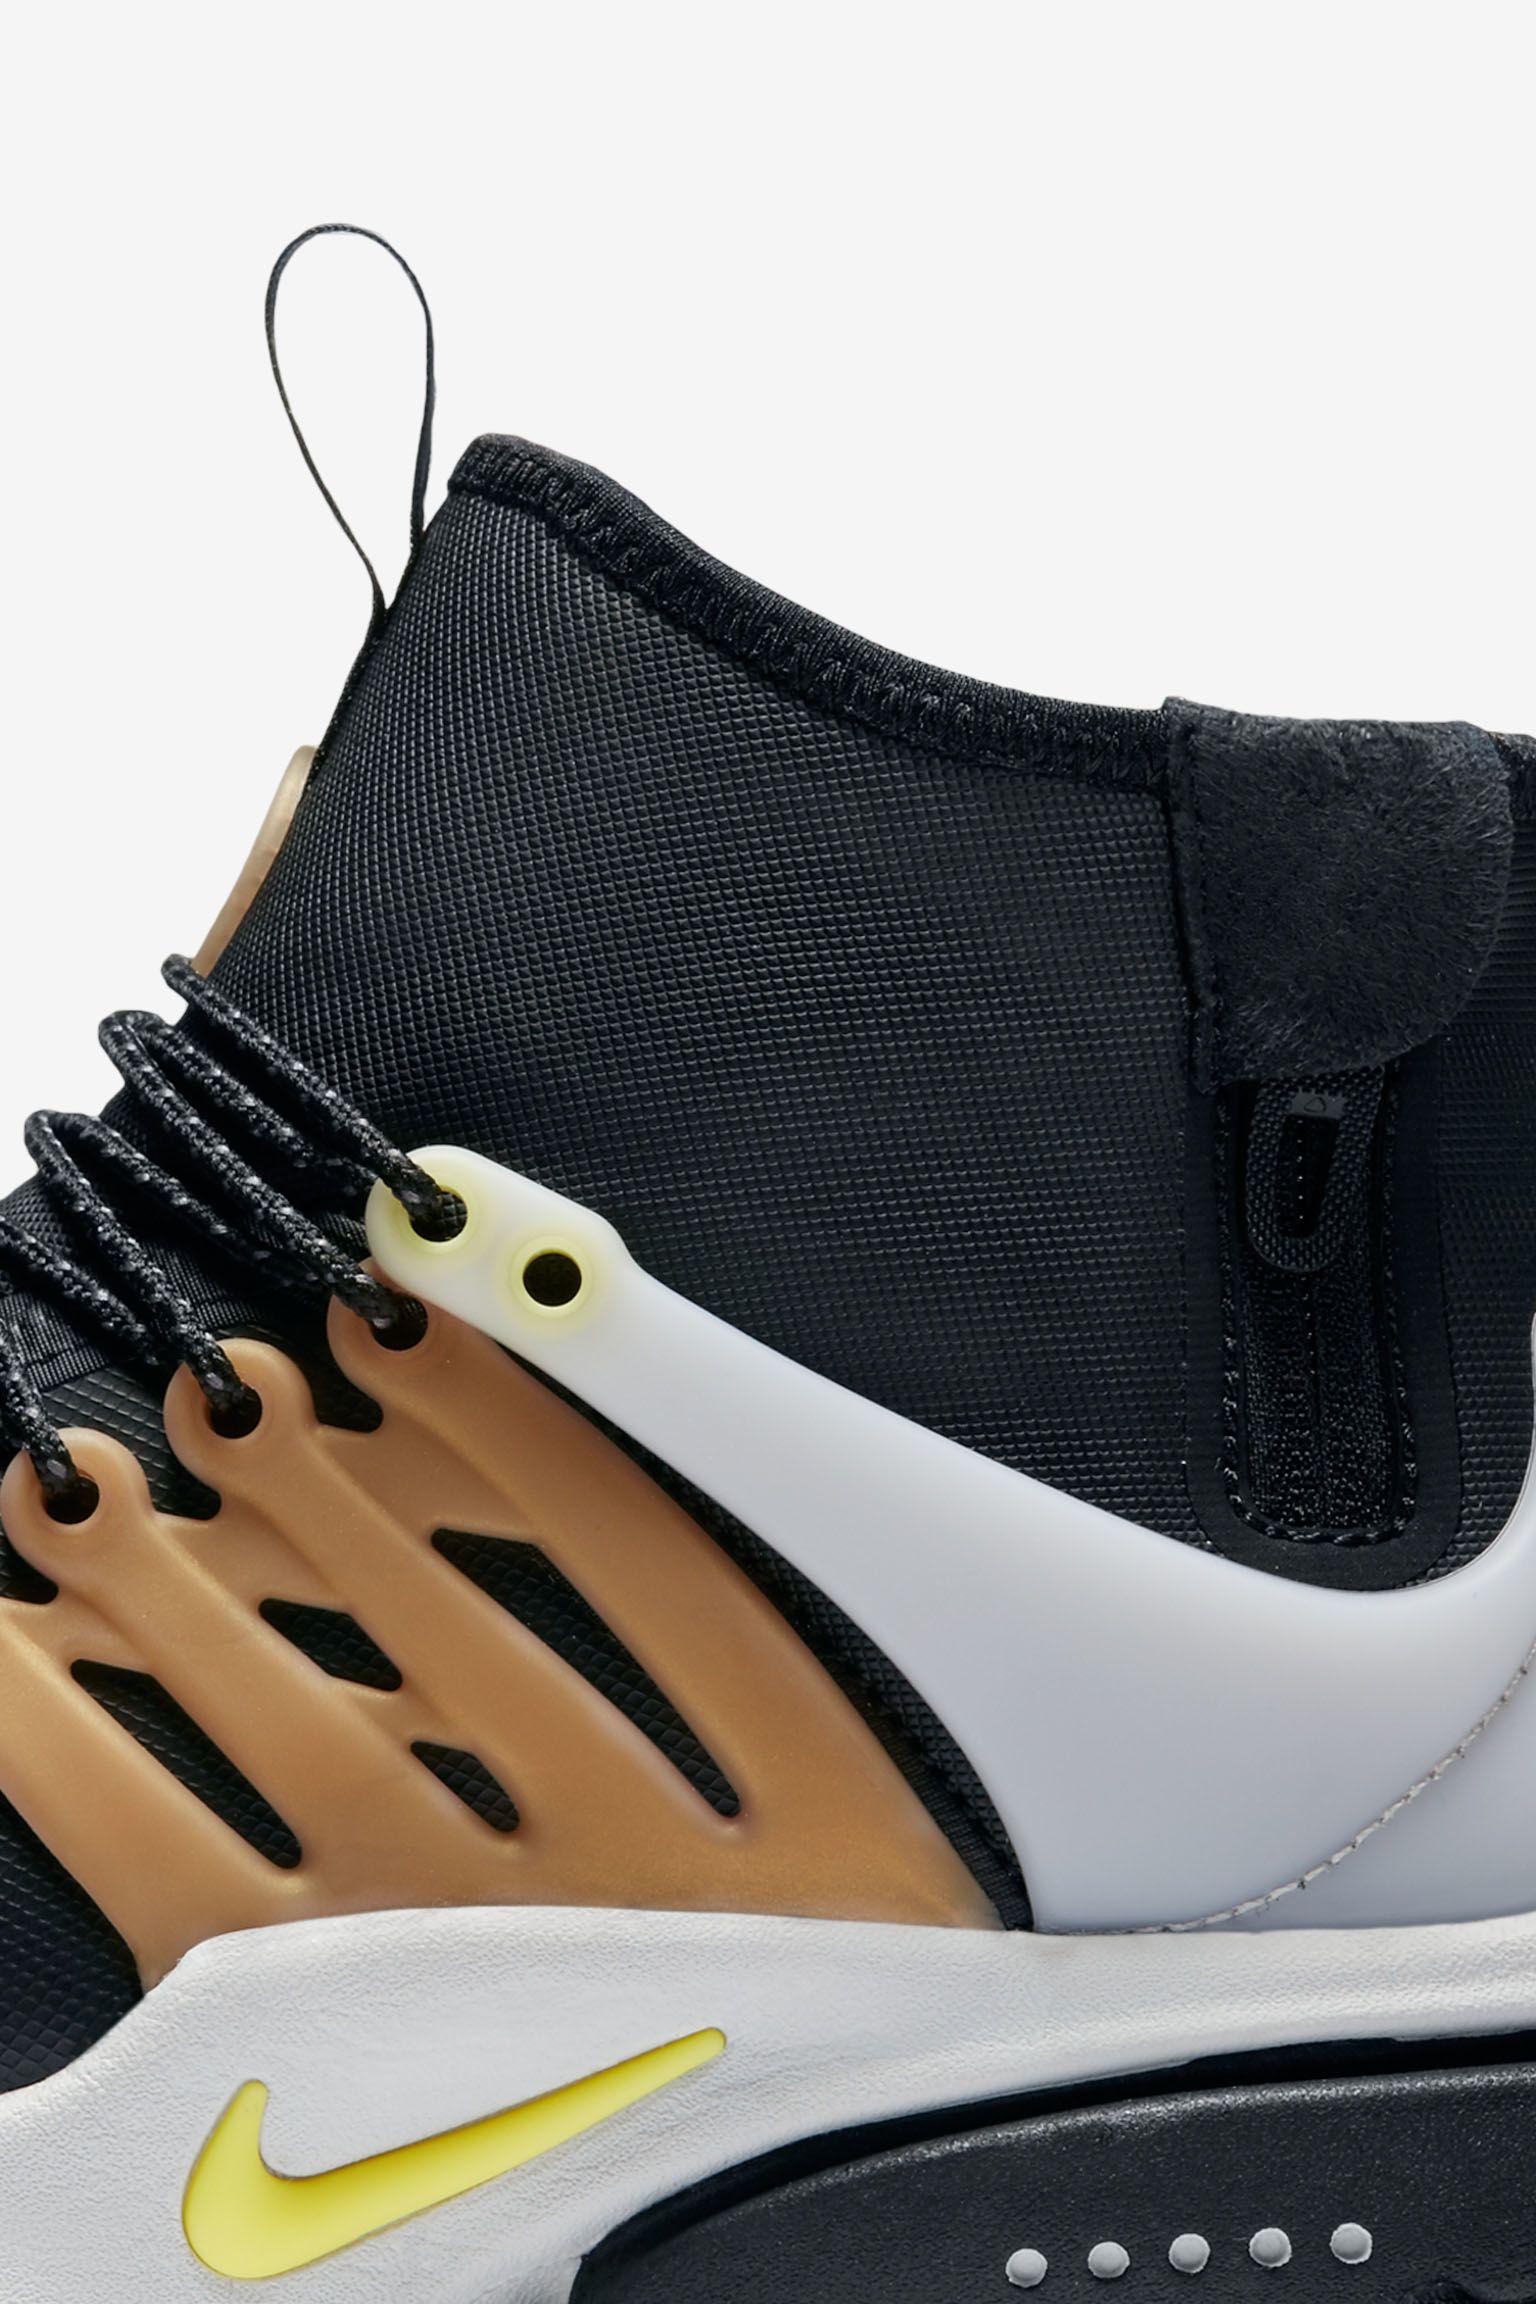 Nike Air Presto Mid Utility Sneakerboot 'Black & Metallic Gold'. Release Date